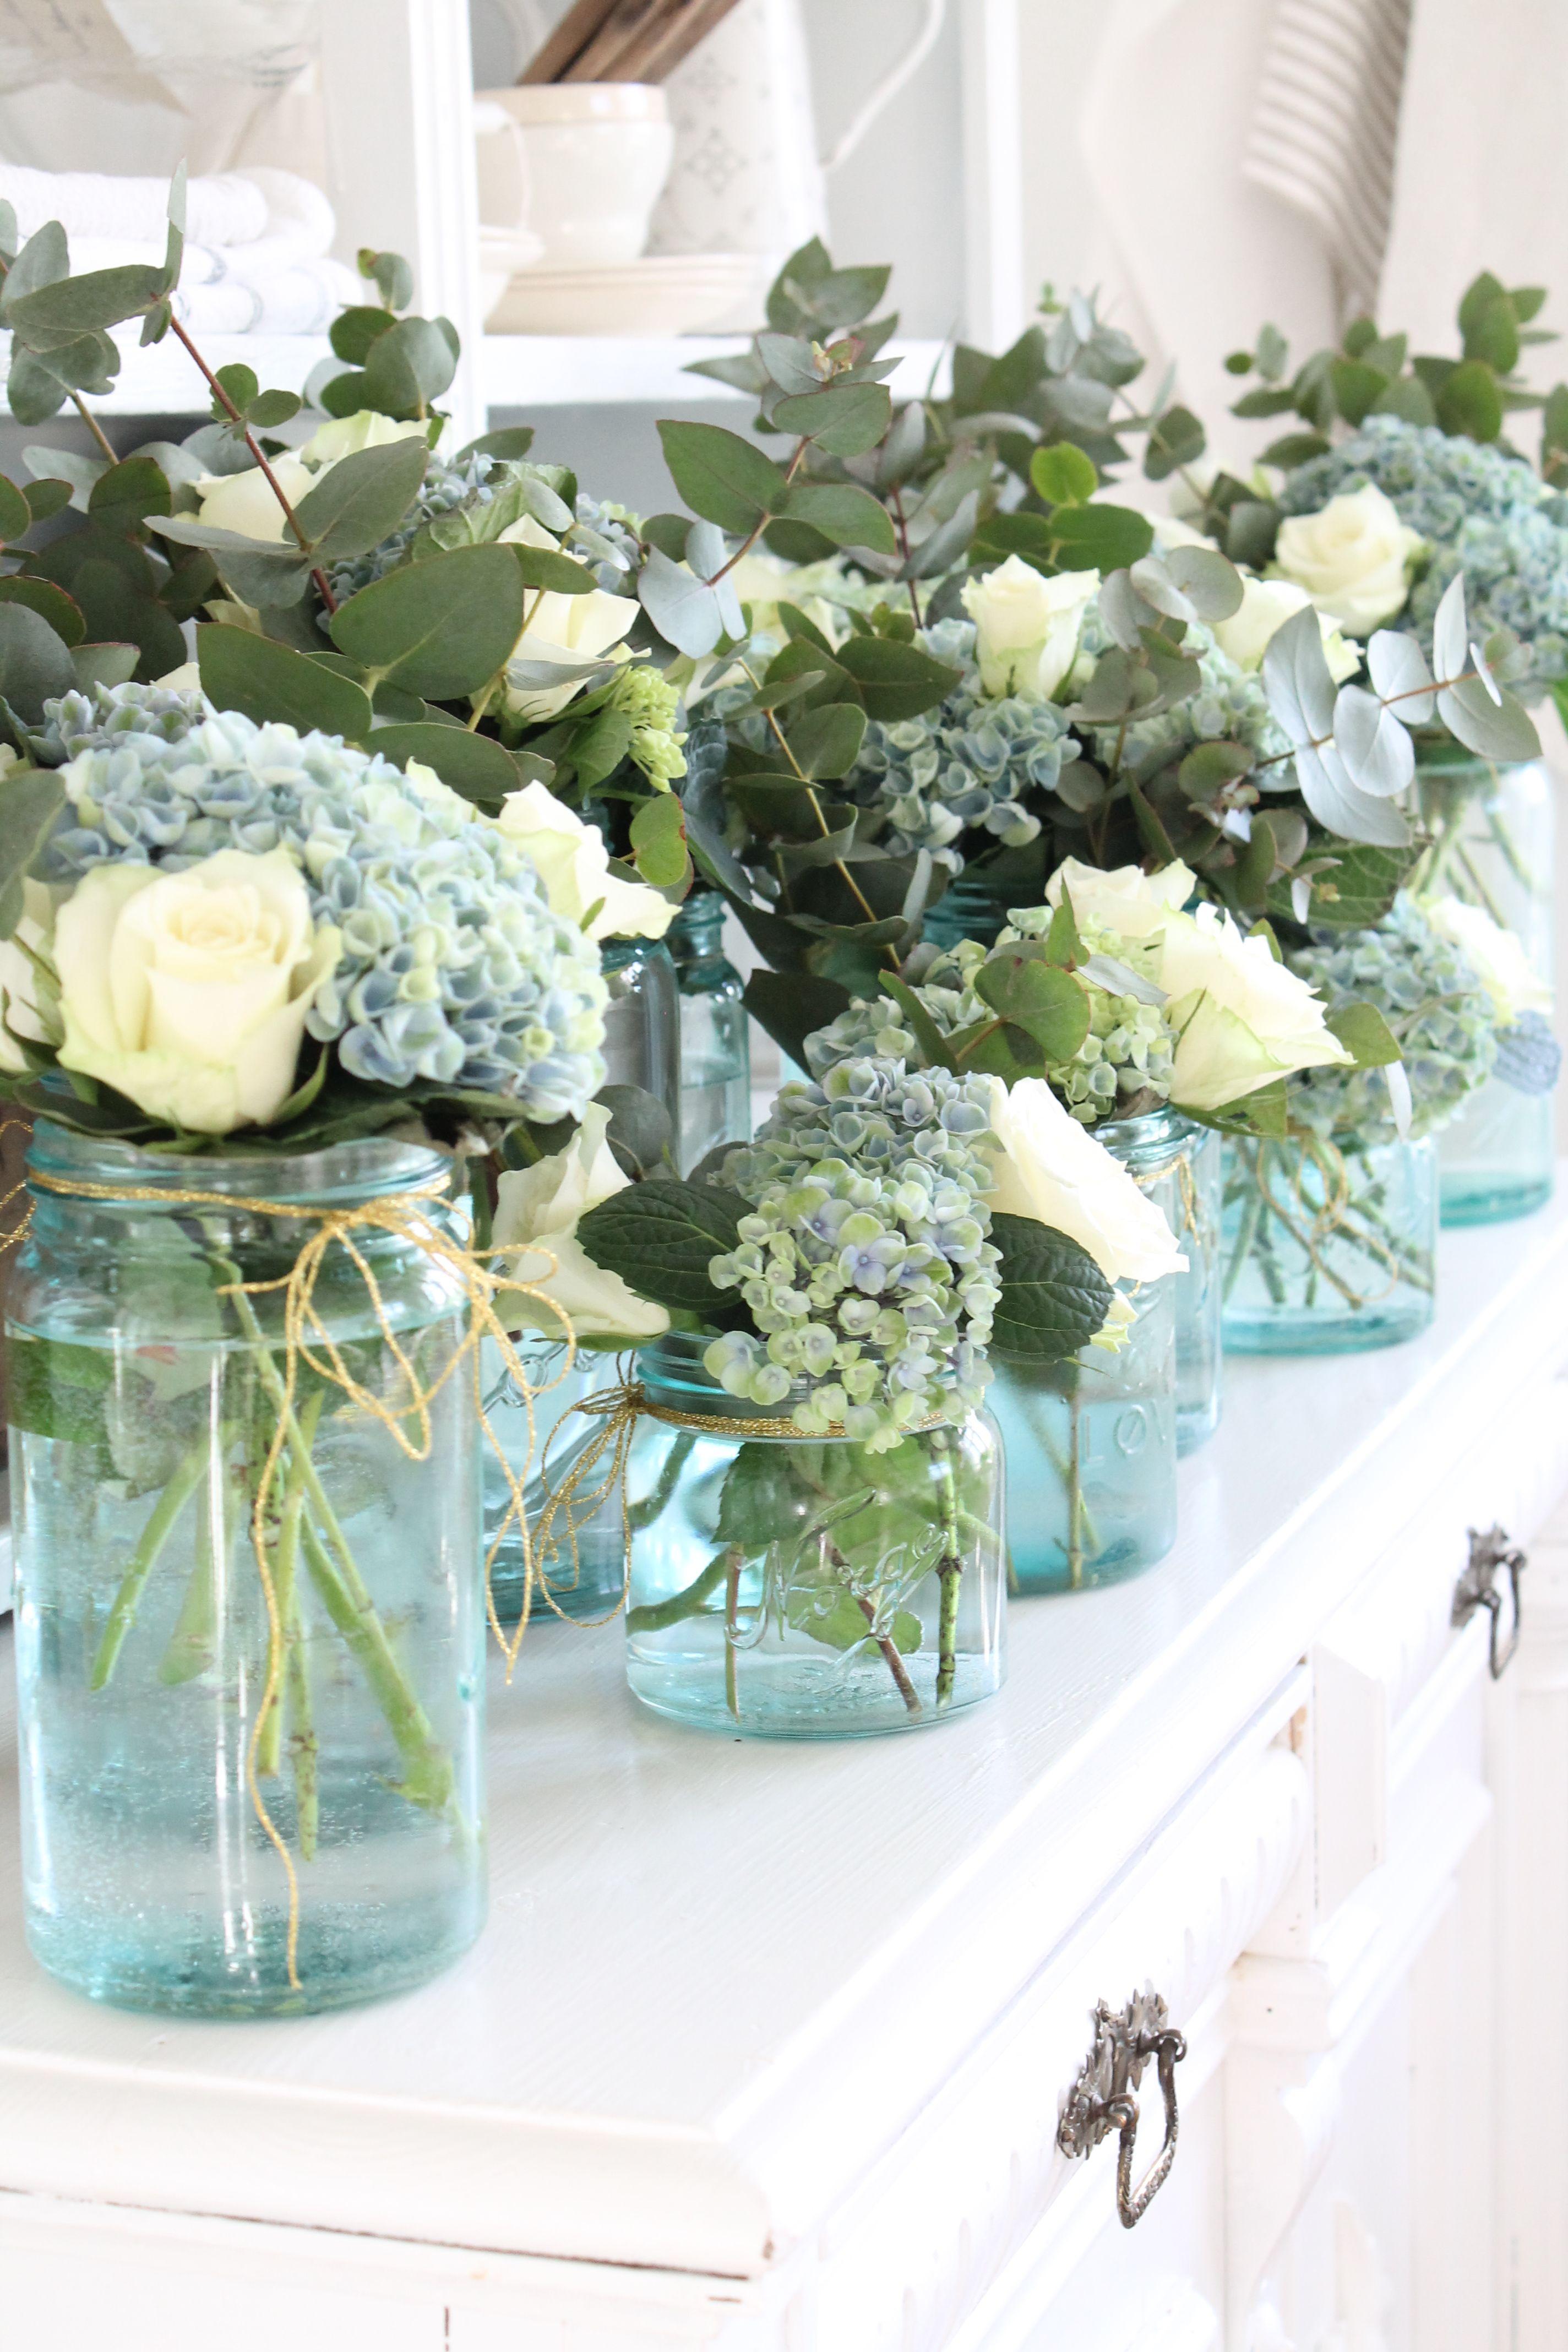 Http Vibekedesign Blogspot No Hortensien Arrangements Hochzeit Grun Blumengestecke